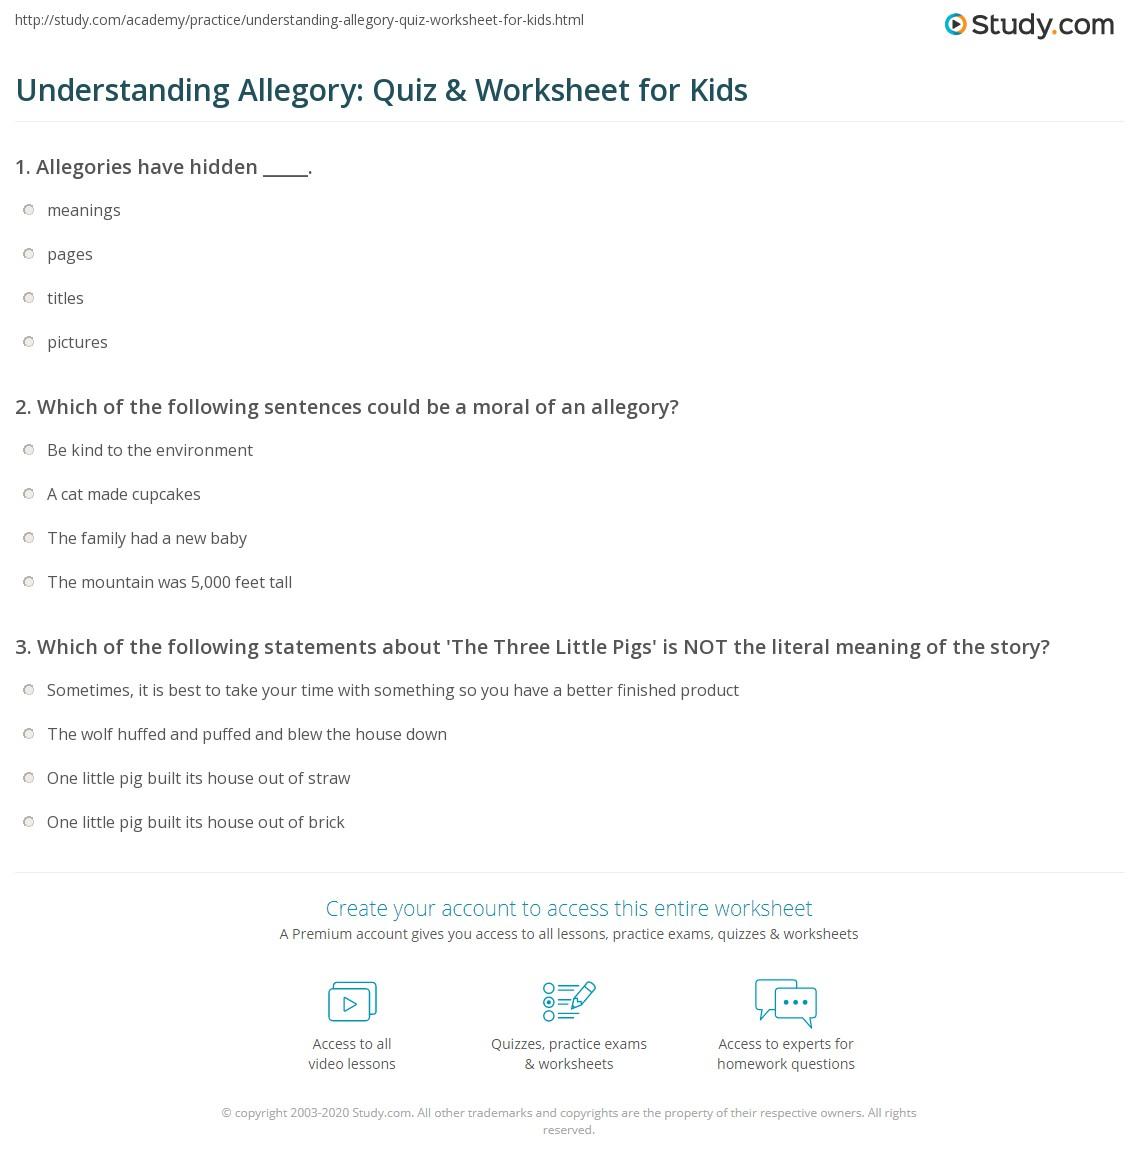 worksheet The Lorax Questions Worksheet understanding allegory quiz worksheet for kids study com print lesson definition examples worksheet